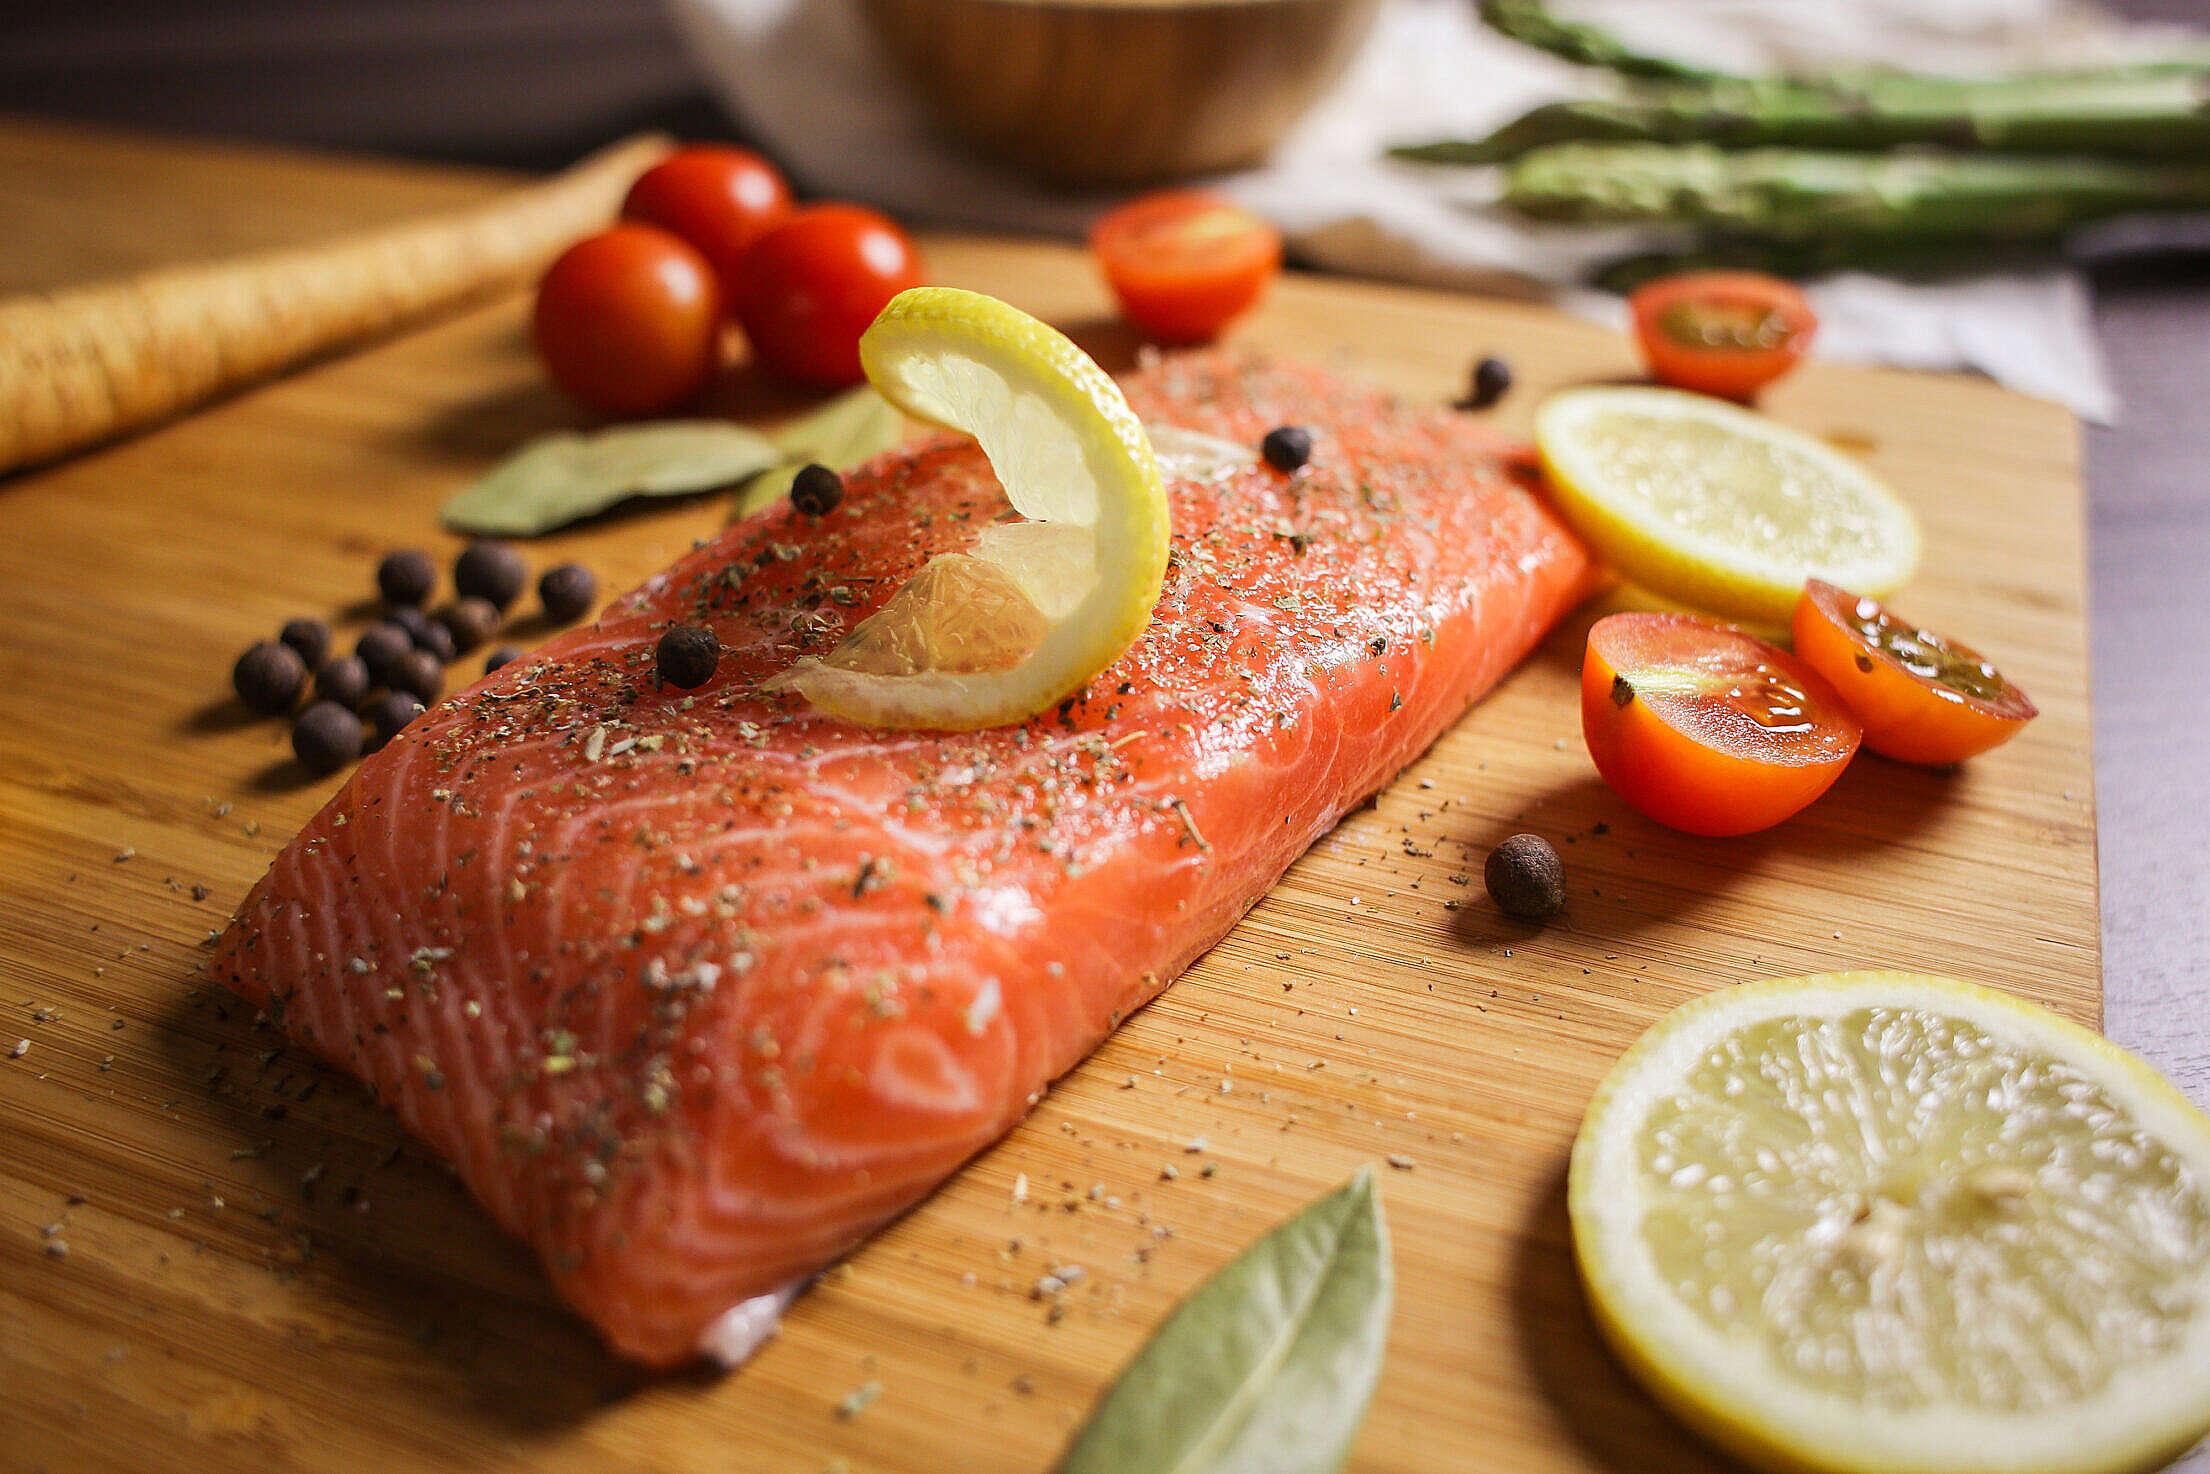 Preparing Salmon Steak Close Up Free Stock Photo